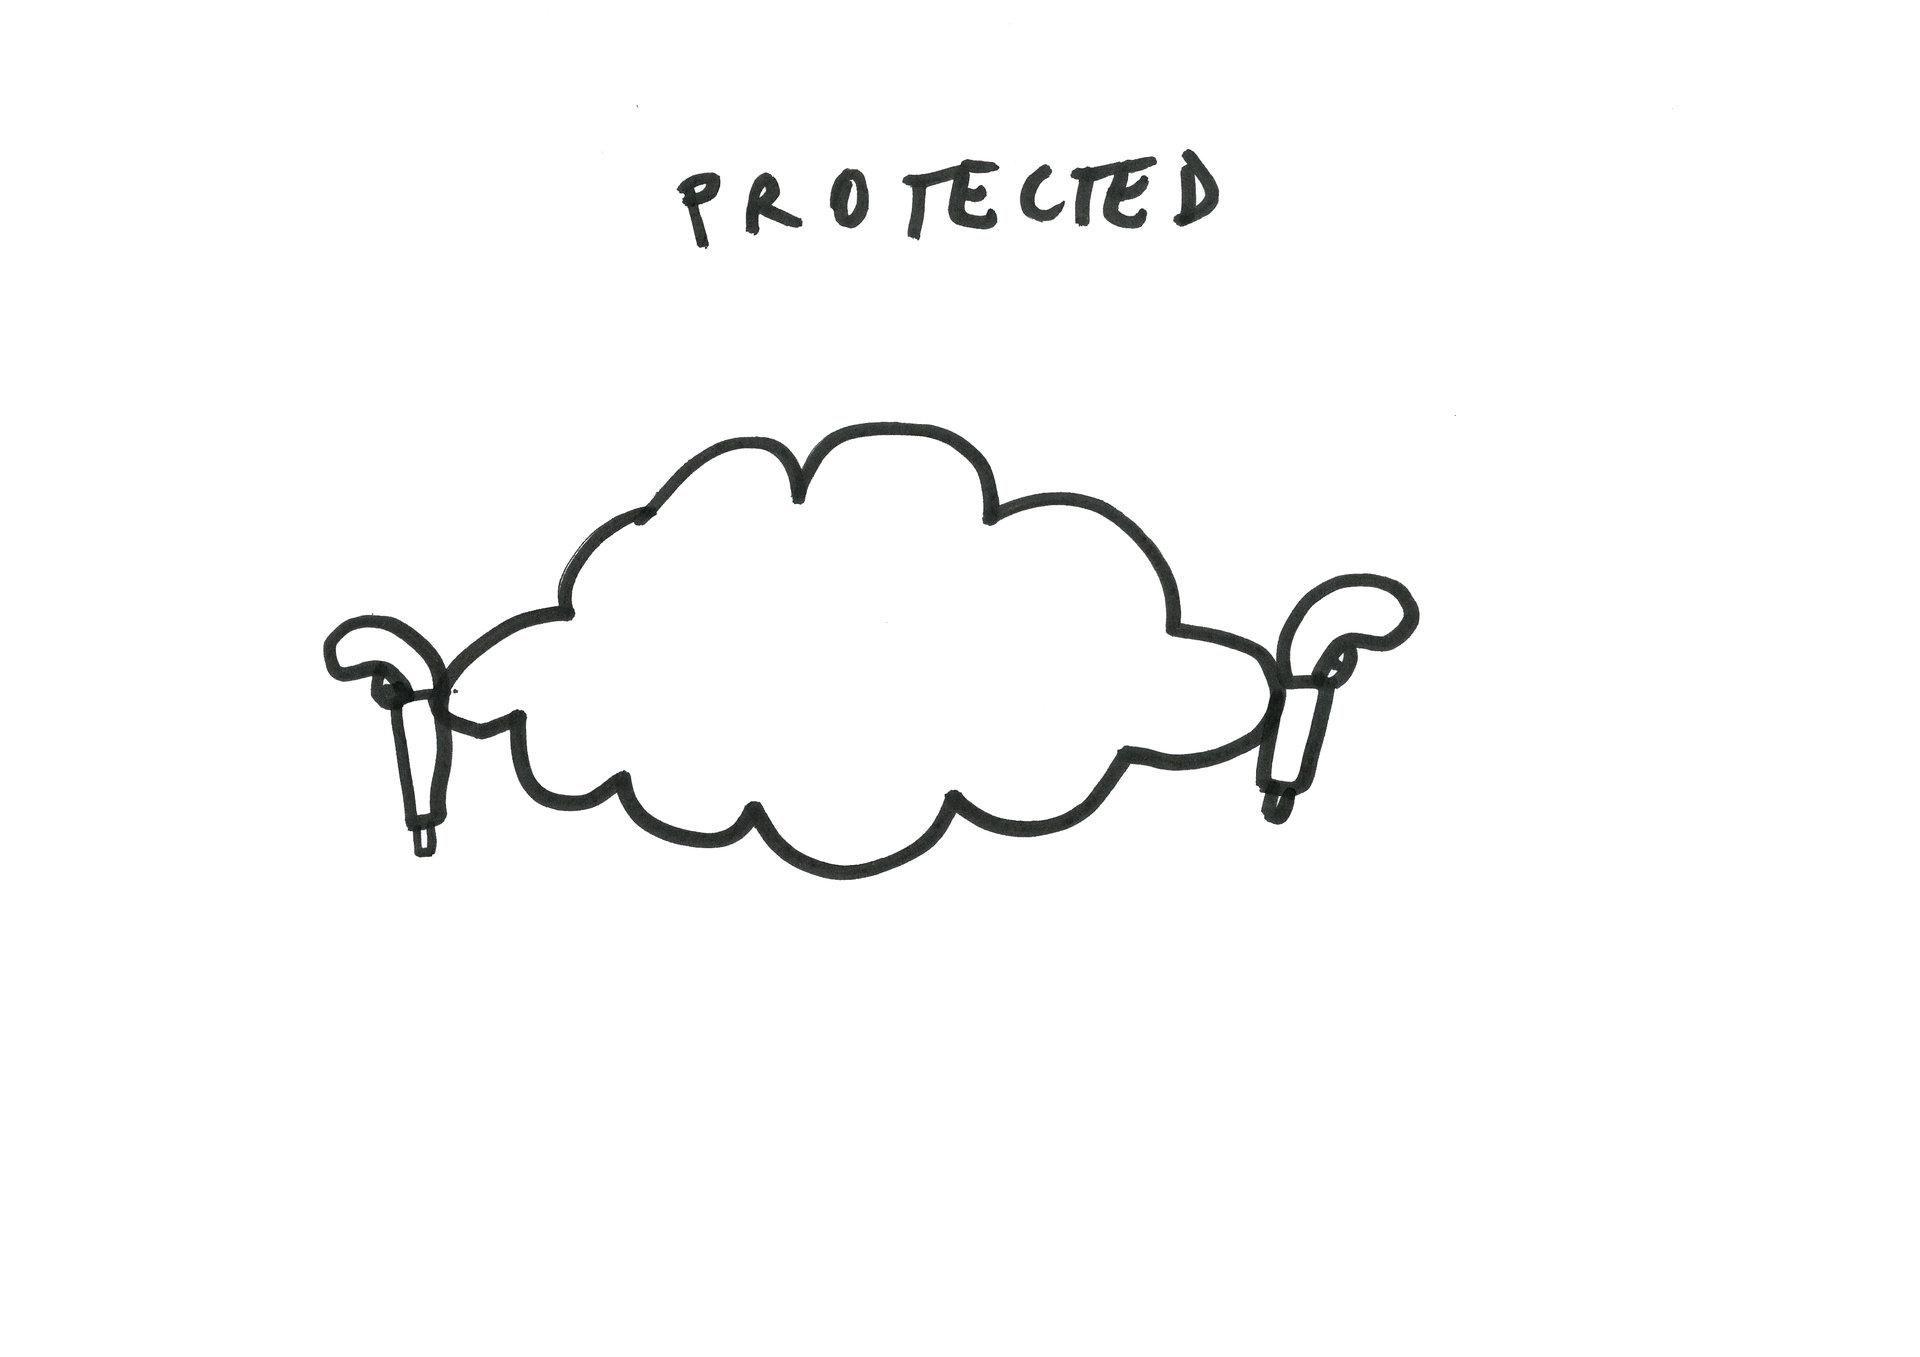 Dan Perjovschi, Come Cloud With Me (09/20), 2012